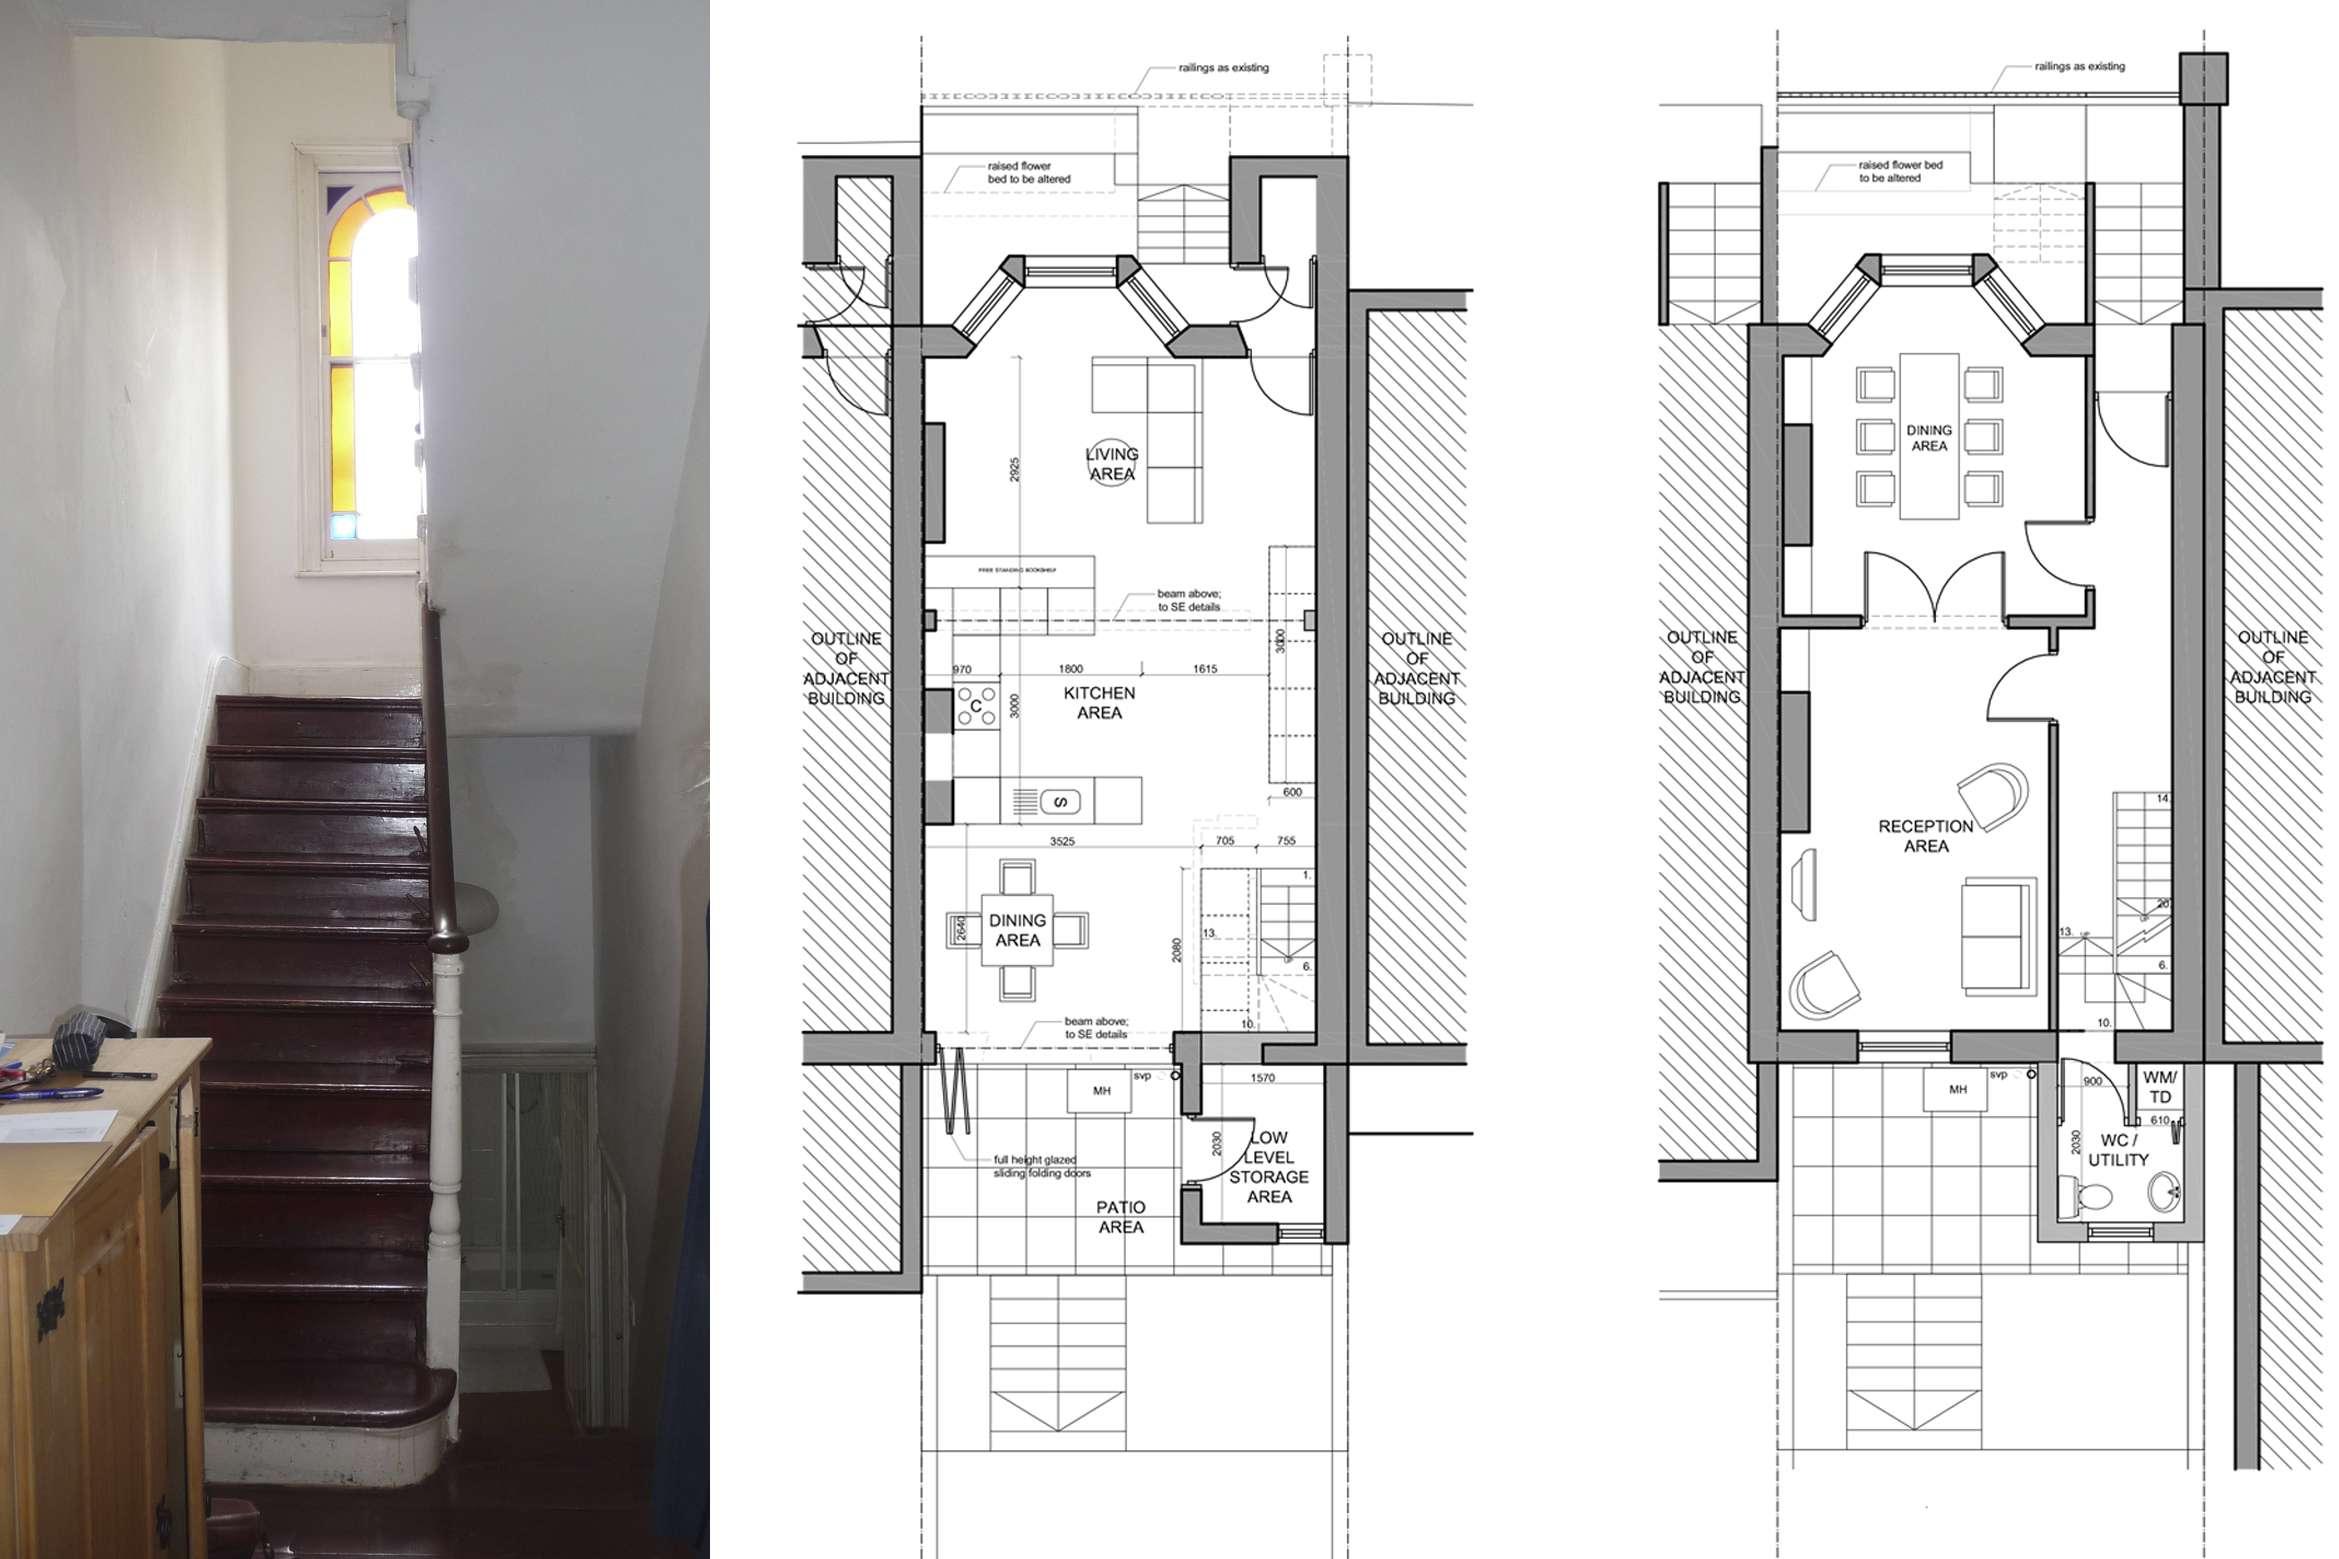 Architect designed mansard roof extension Finsbury Park Islington N7 Lower floor plans 1 Finsbury Park, Islington N7 | Mansard roof extension